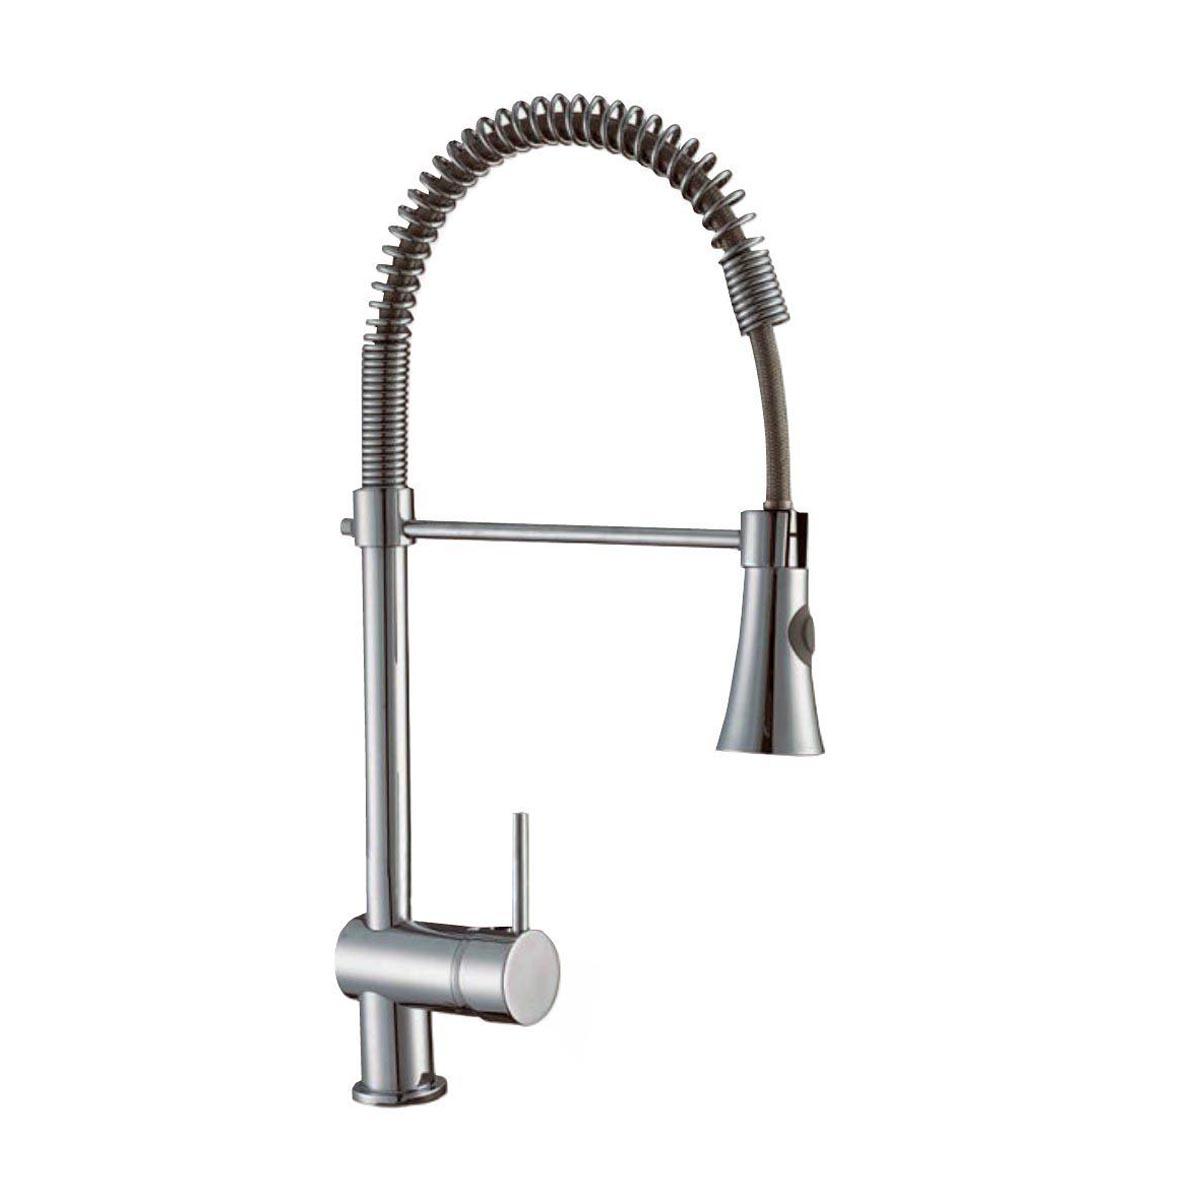 Finiture lavandino rubinetteria cucina molla a spirale - Pulire tubi lavandino cucina ...